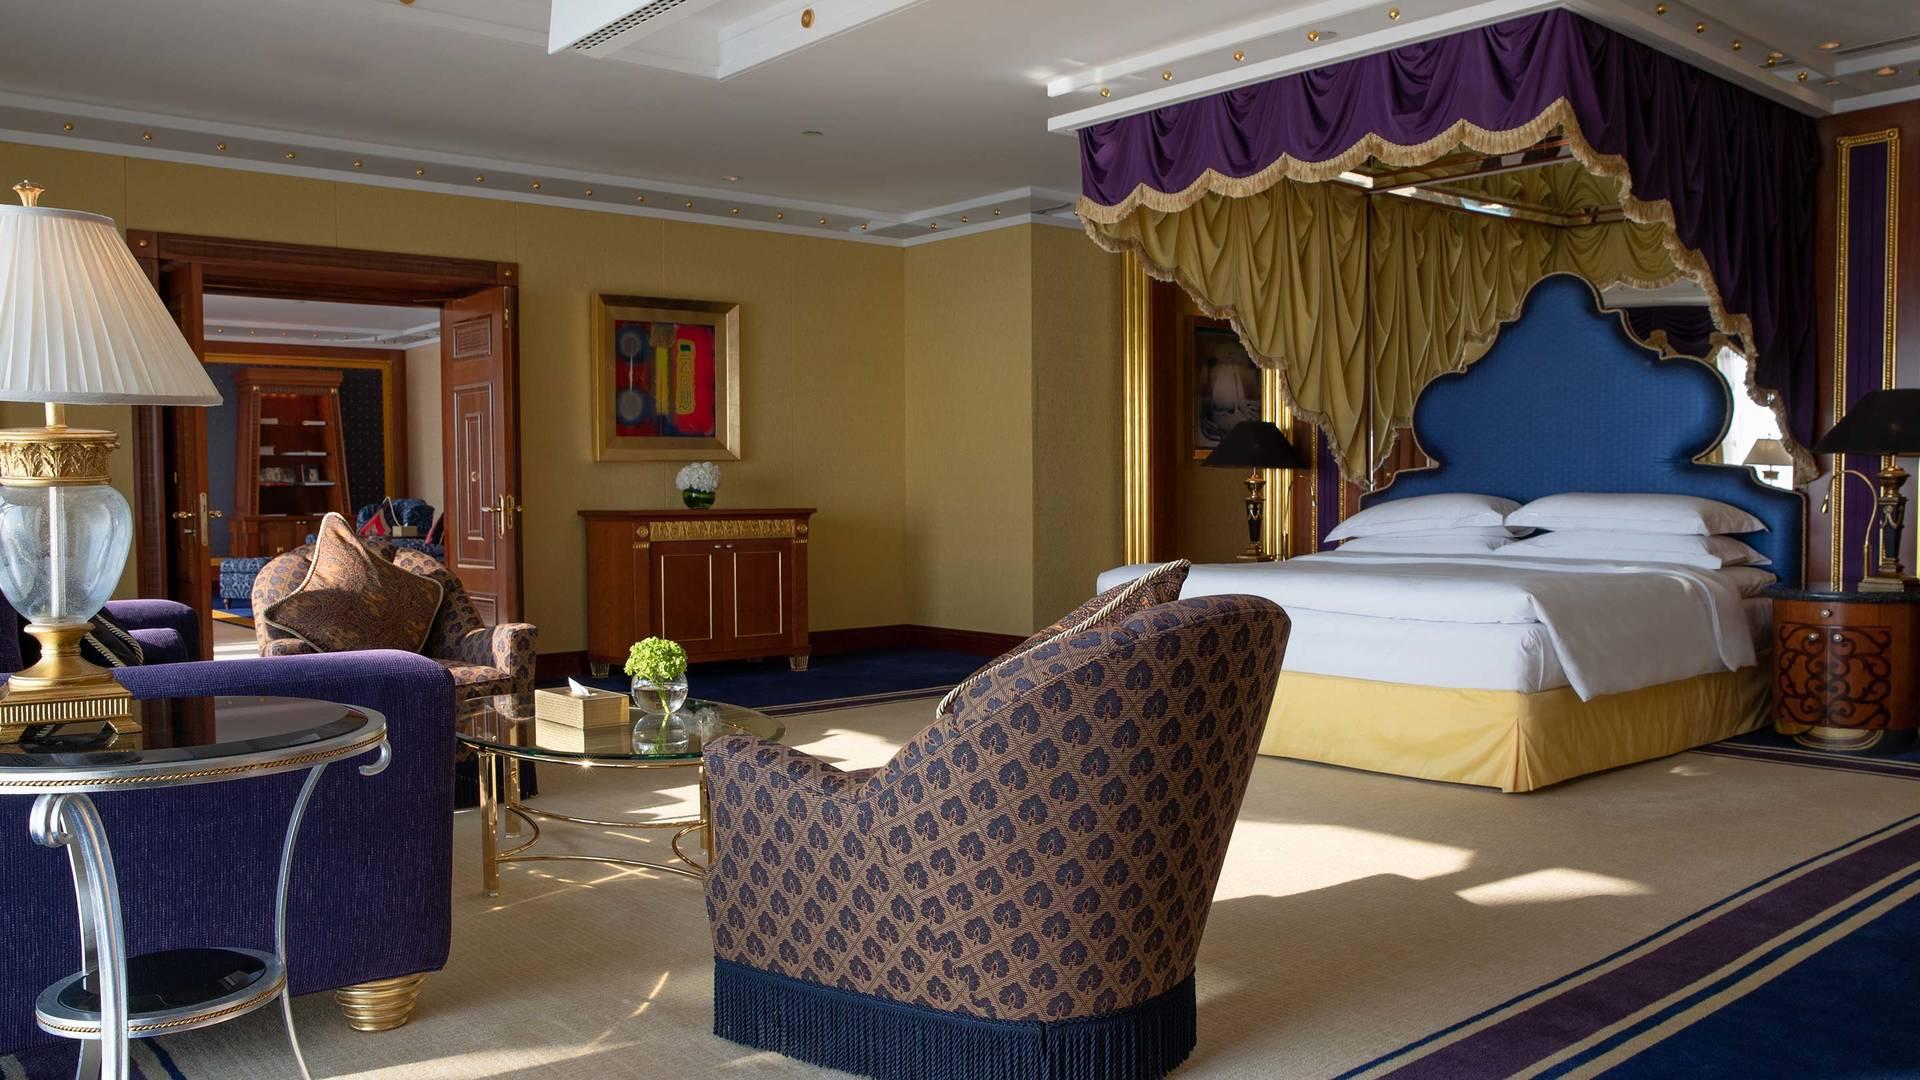 Jumeirah Burj presidential suite Al Arab Master bedroom 2_16-9